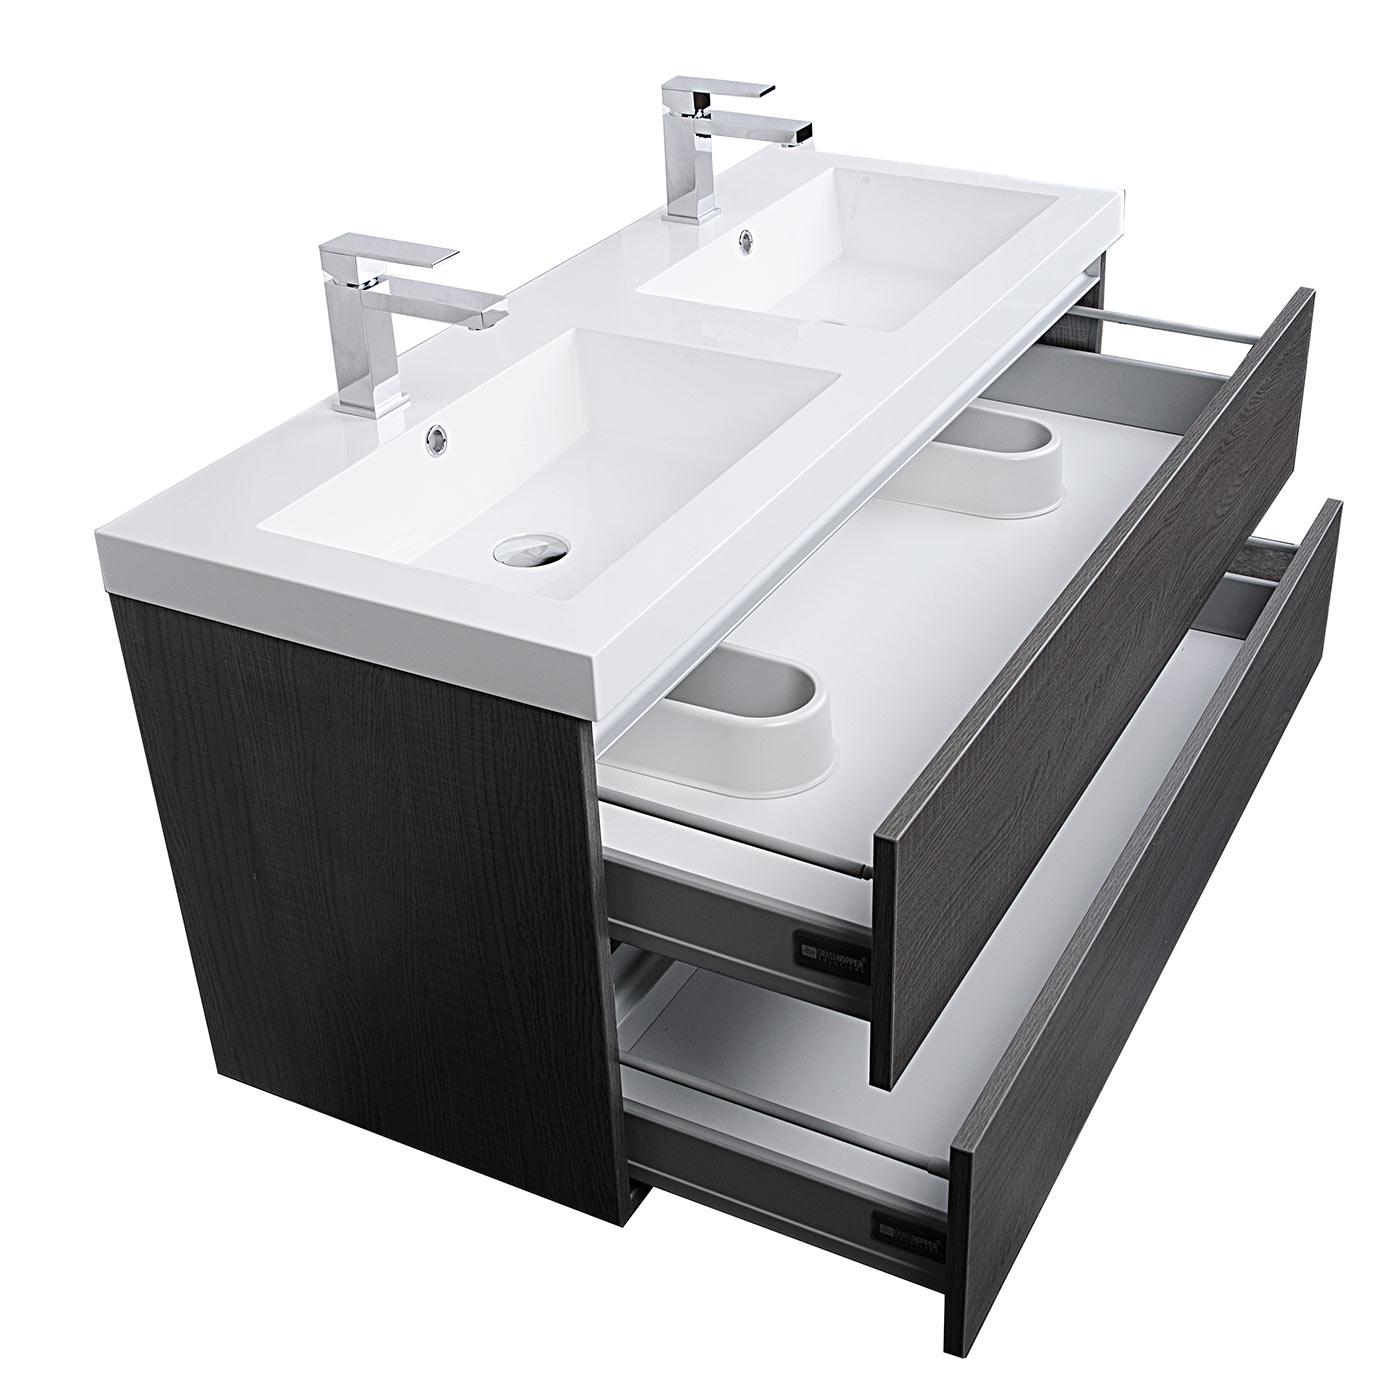 Buy Valencia 47 Inch Wall-Mount Double Bathroom Vanity Set ...